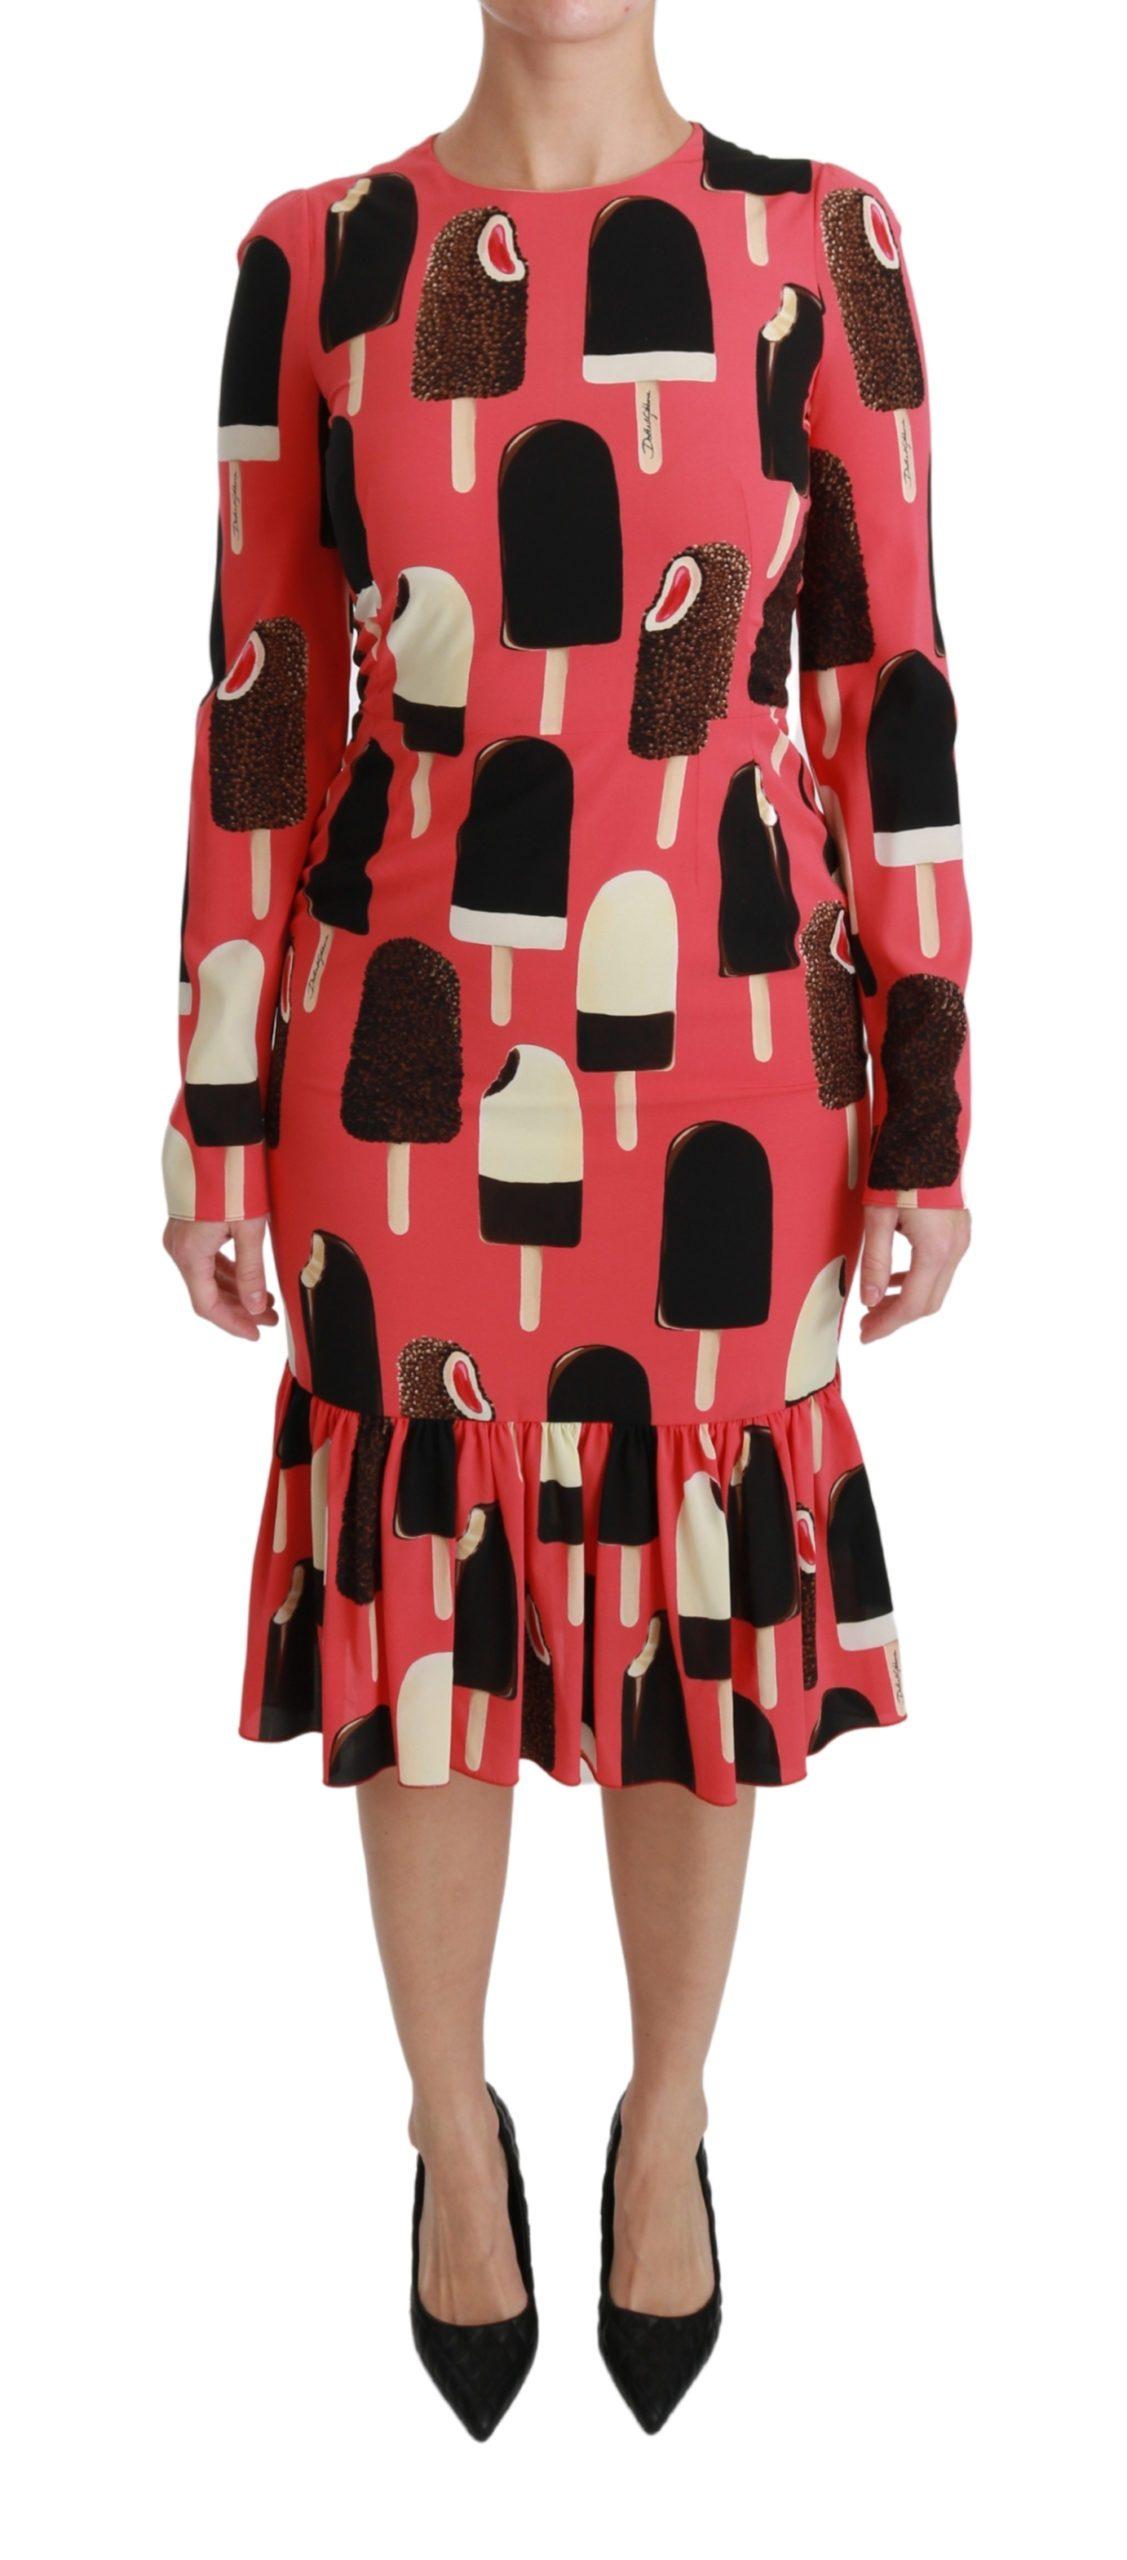 Dolce & Gabbana Women's Silk Stretch Ice Cream Sheath Dress Pink DR2506 - IT36 | XS